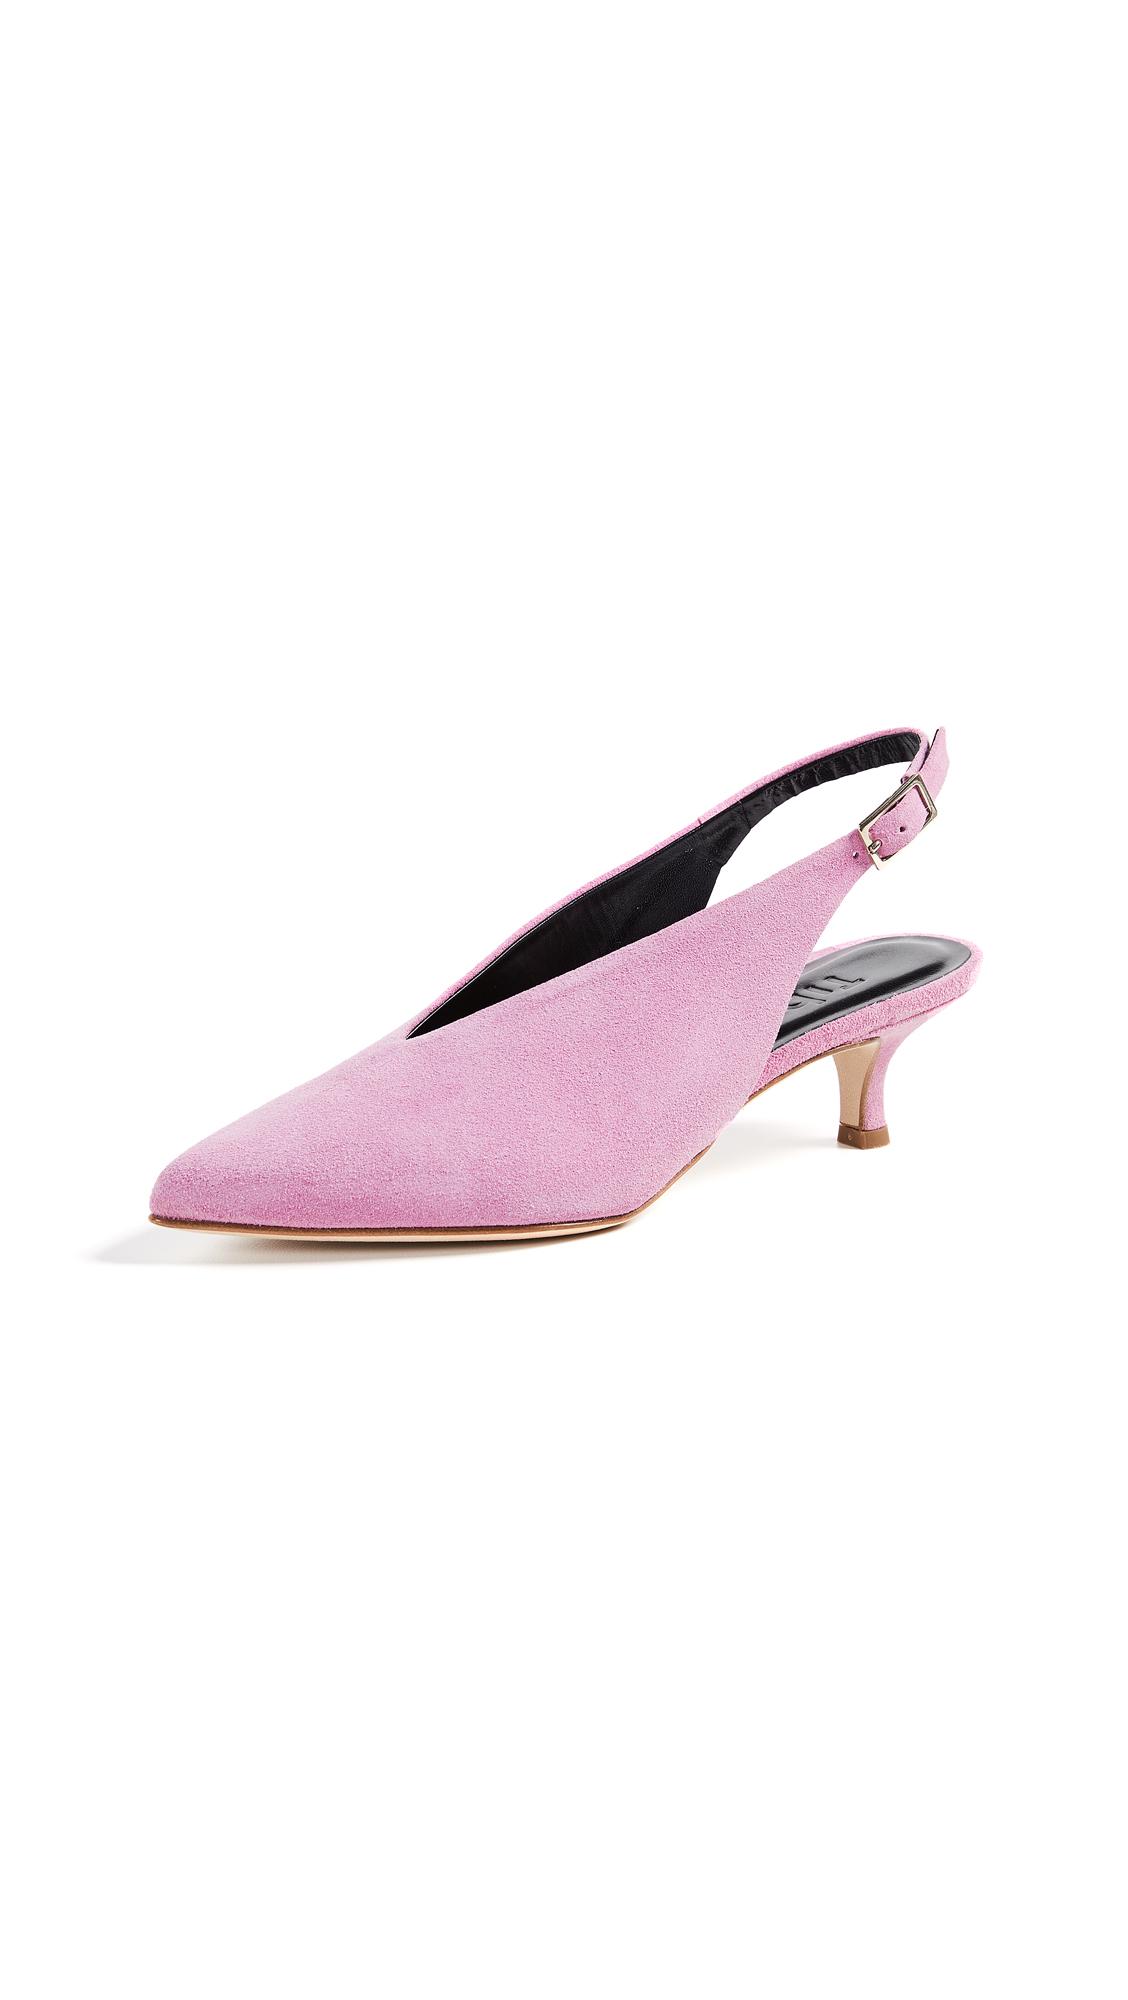 Tibi Lia Slingback Pumps - Pink